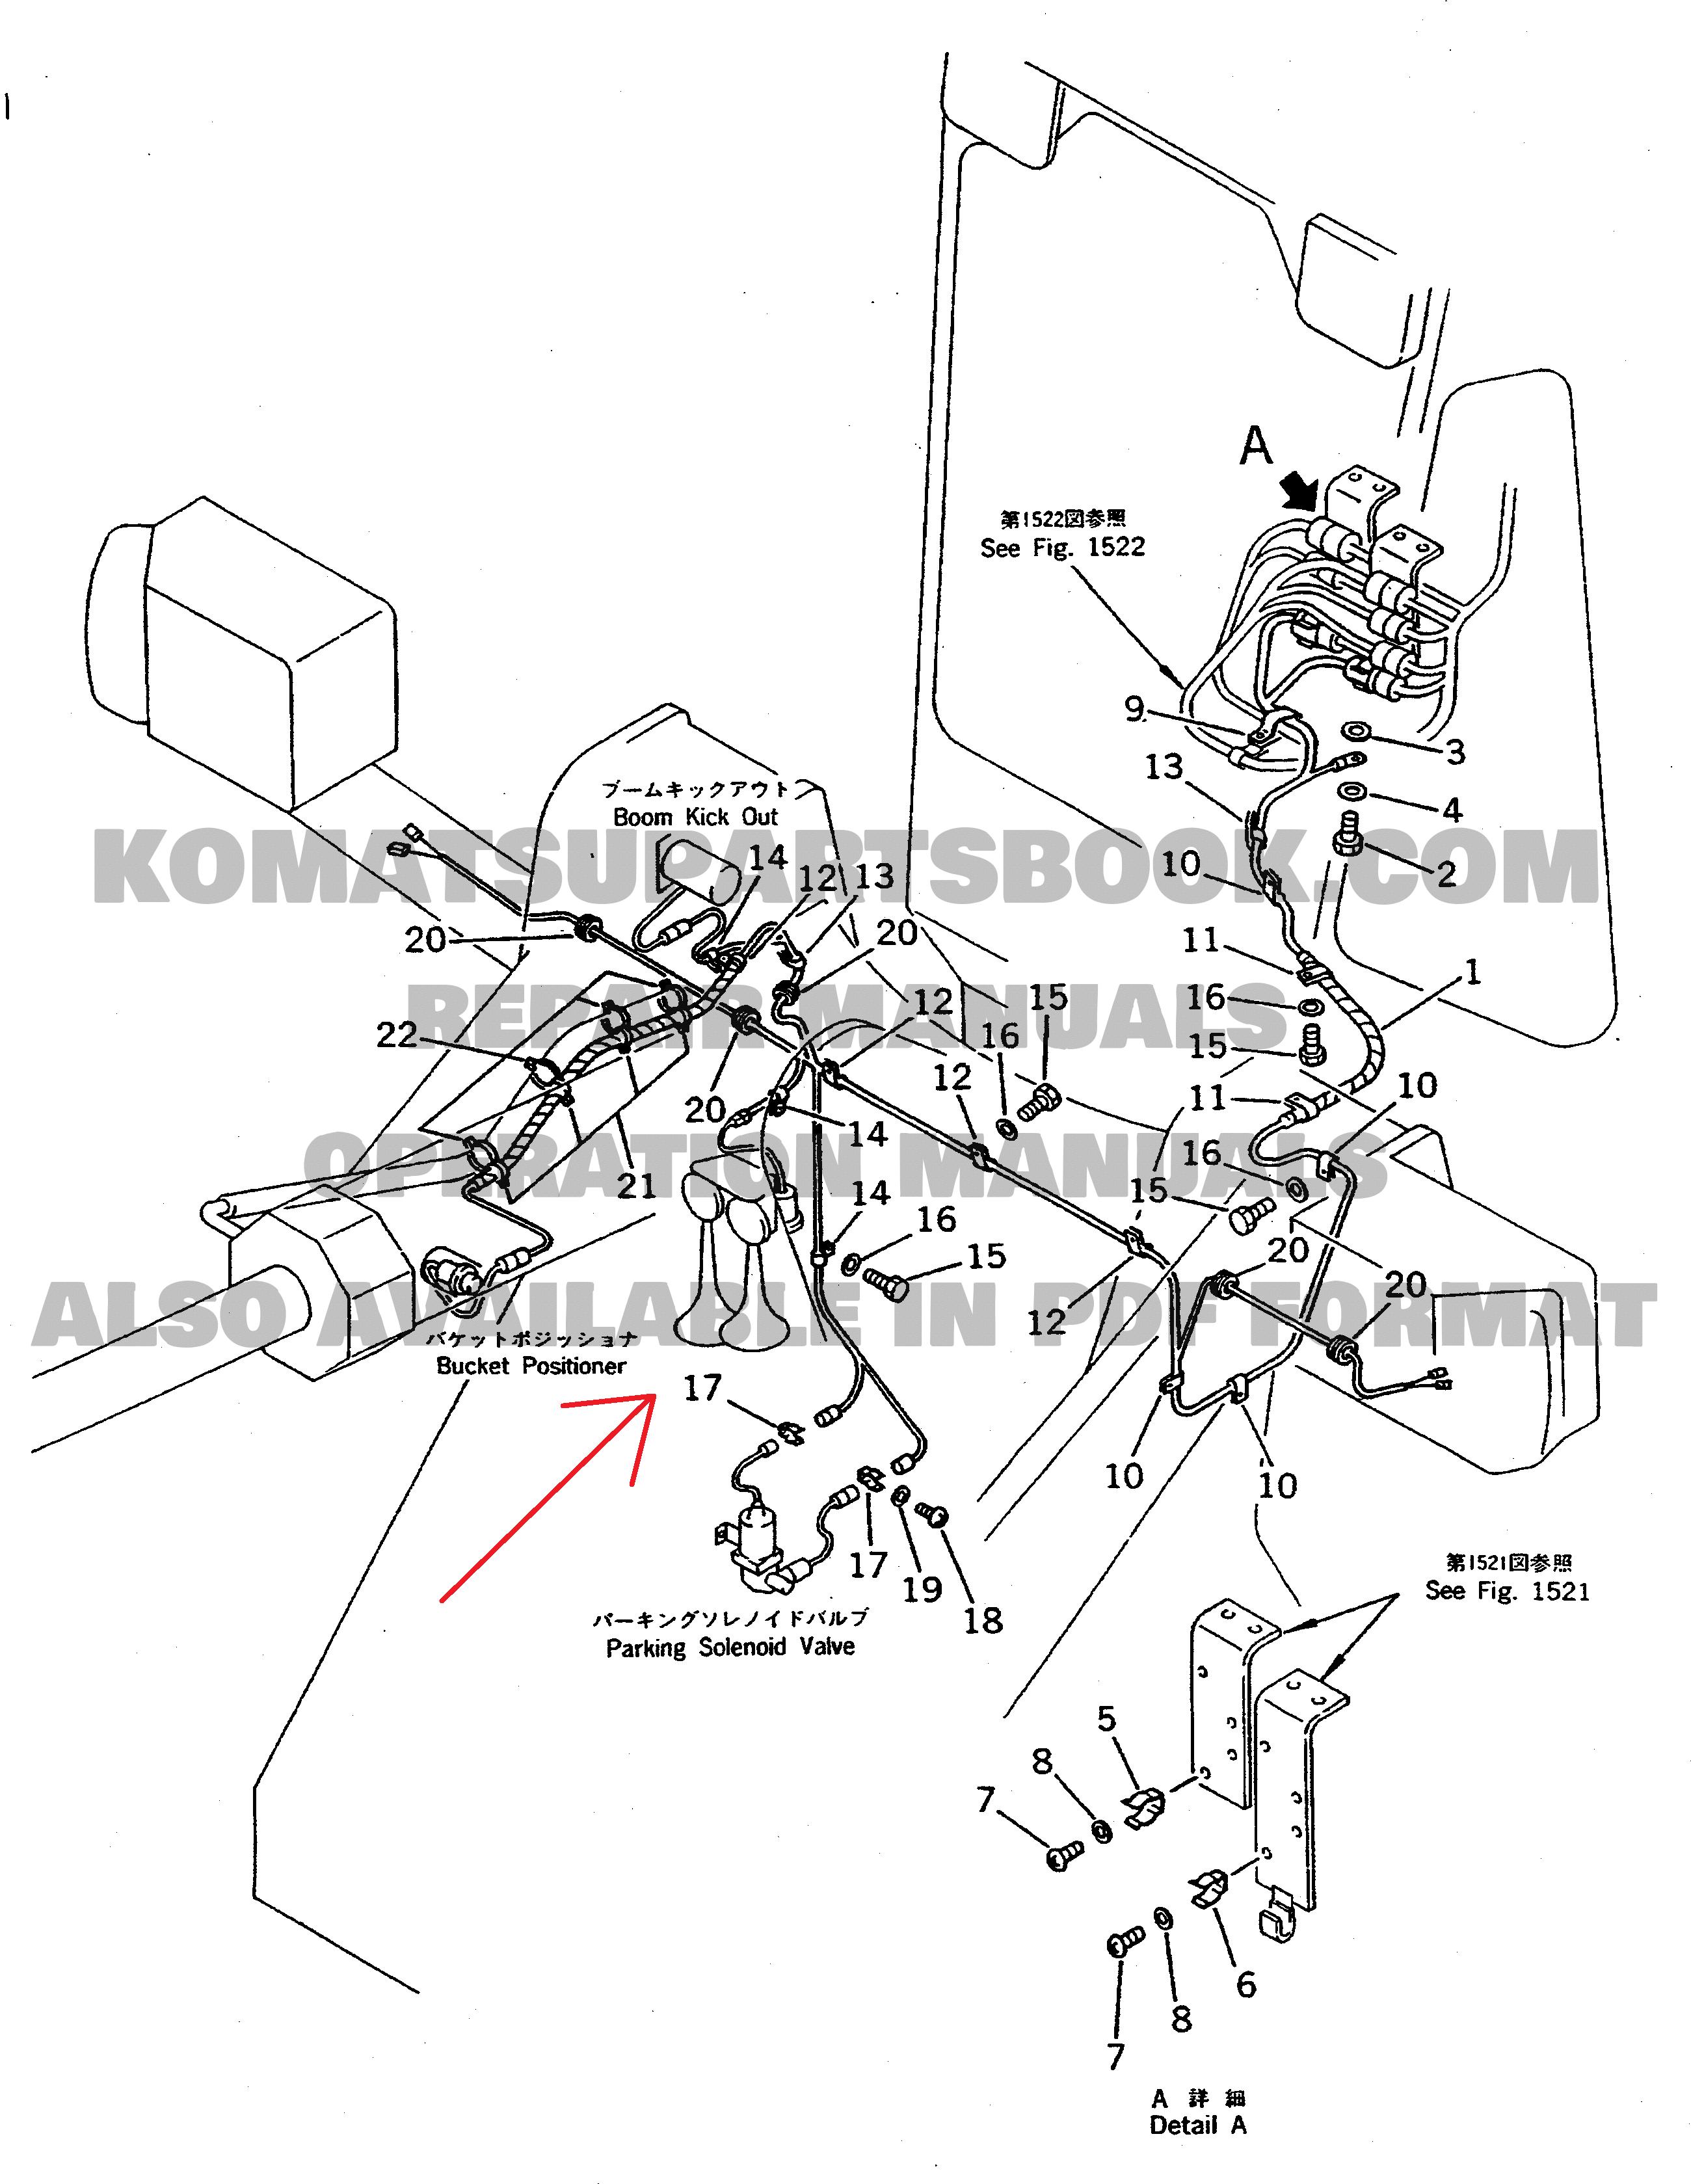 2014 11 01_192351_komatsu_wa 500_front_electrical_edited komatsu fg15 wiring diagram komatsu 15 forklift komatsu fg25st  at aneh.co